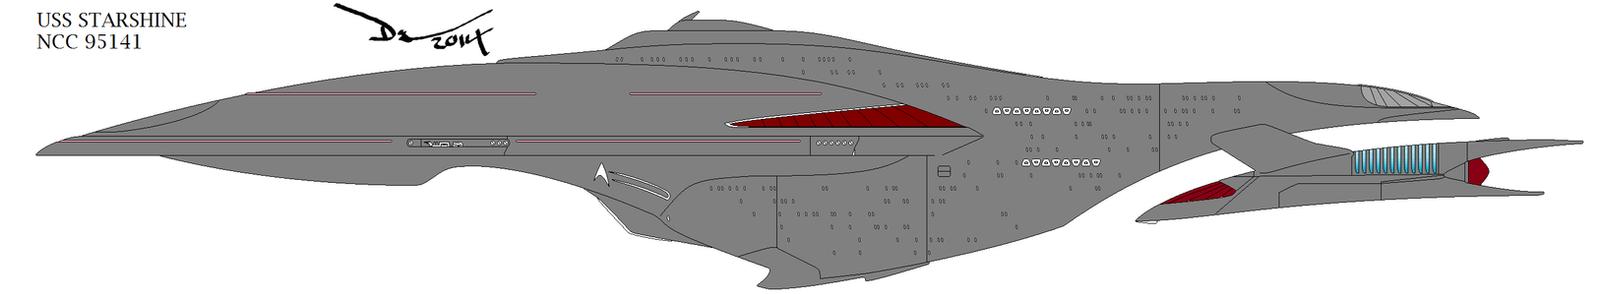 USS Starshine by Darkaiz